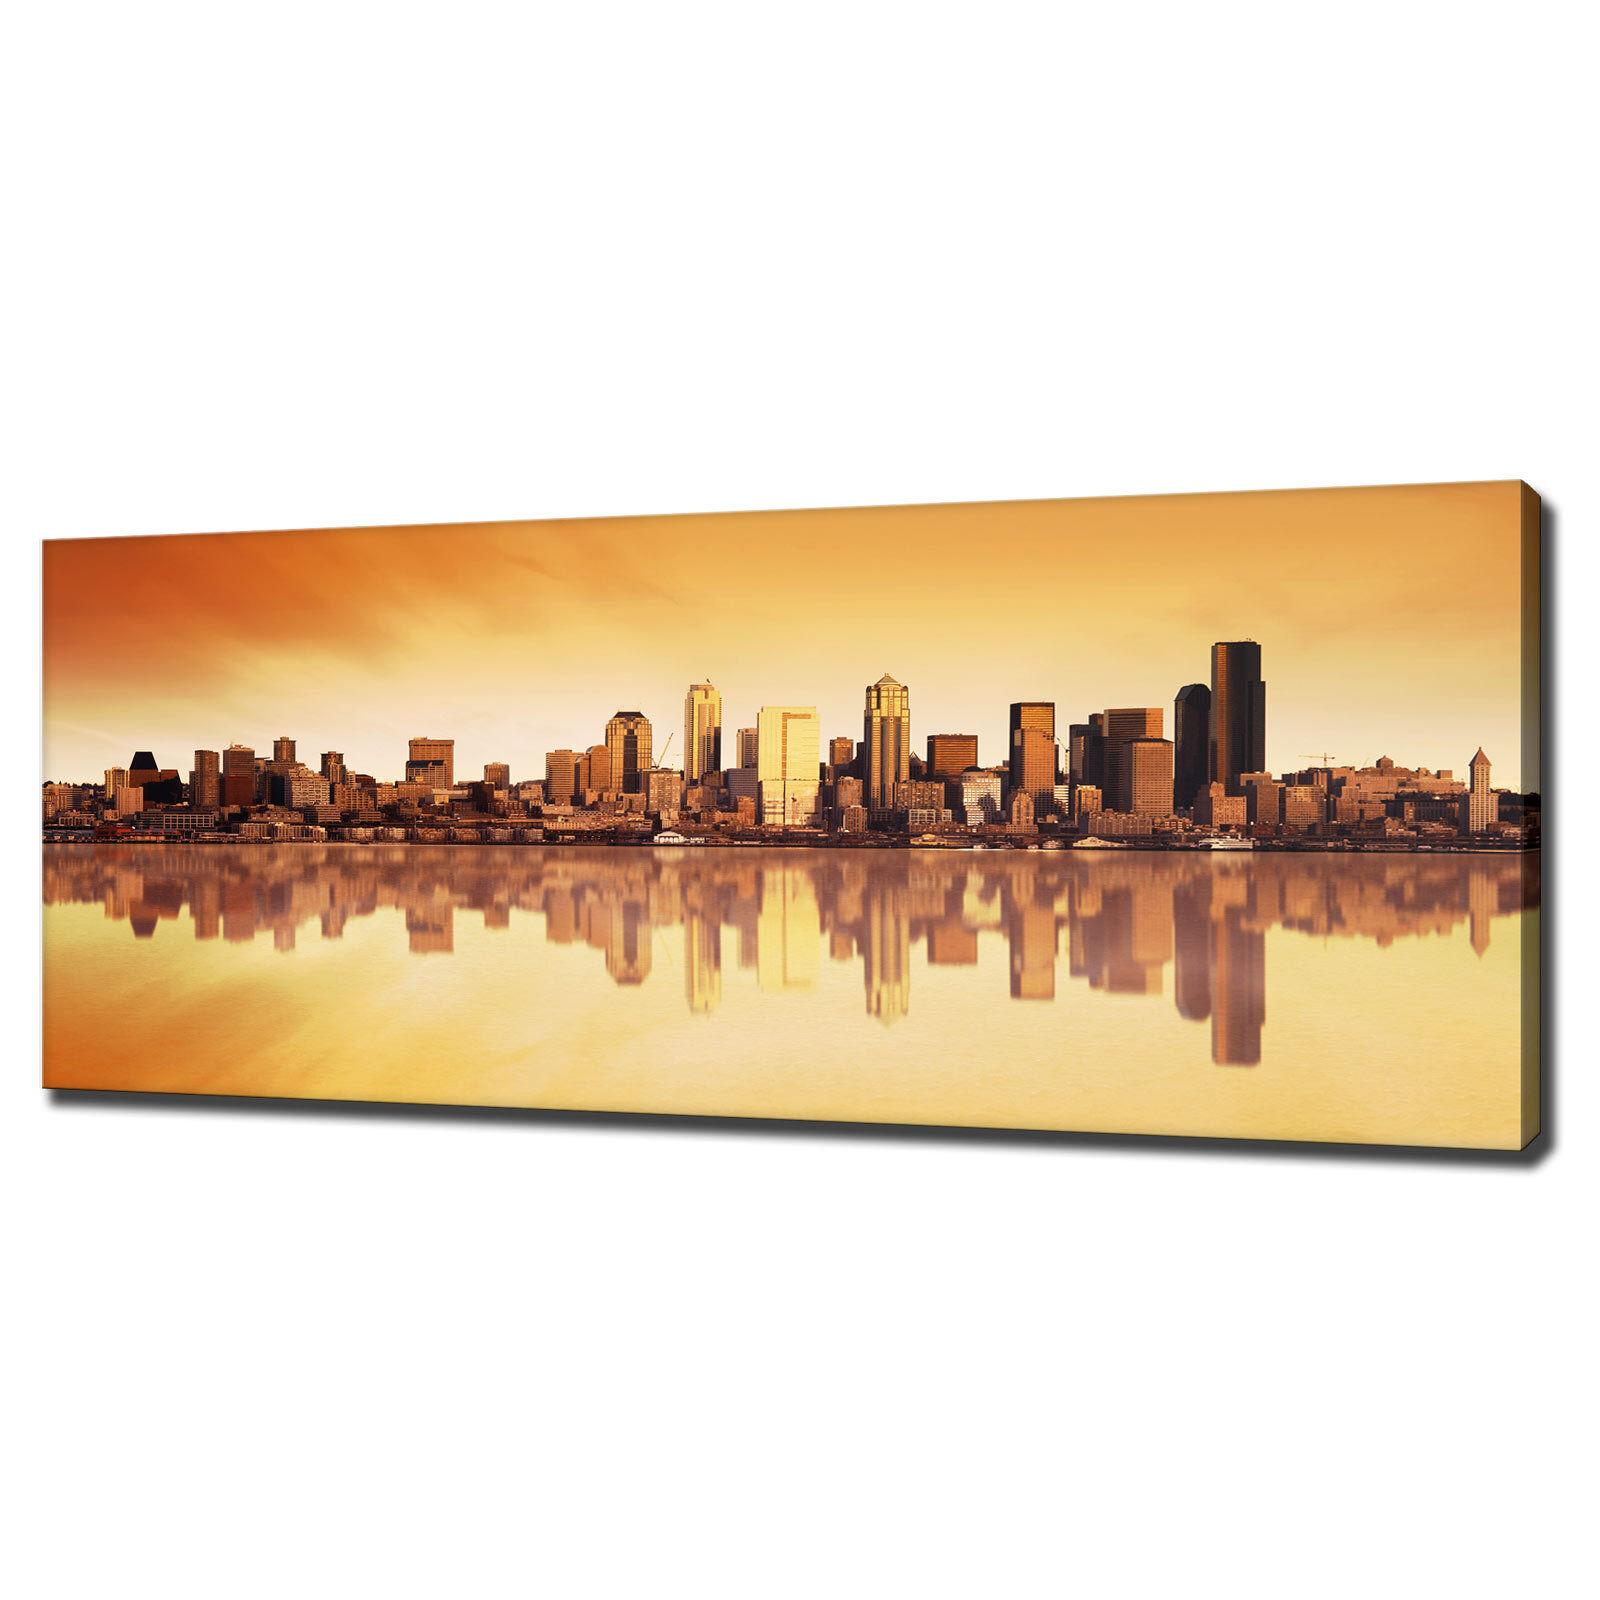 MANHATTAN NEW YORK SKYLINE Horizon Tela Stampa Foto Wall Art CONSEGNA GRATUITA